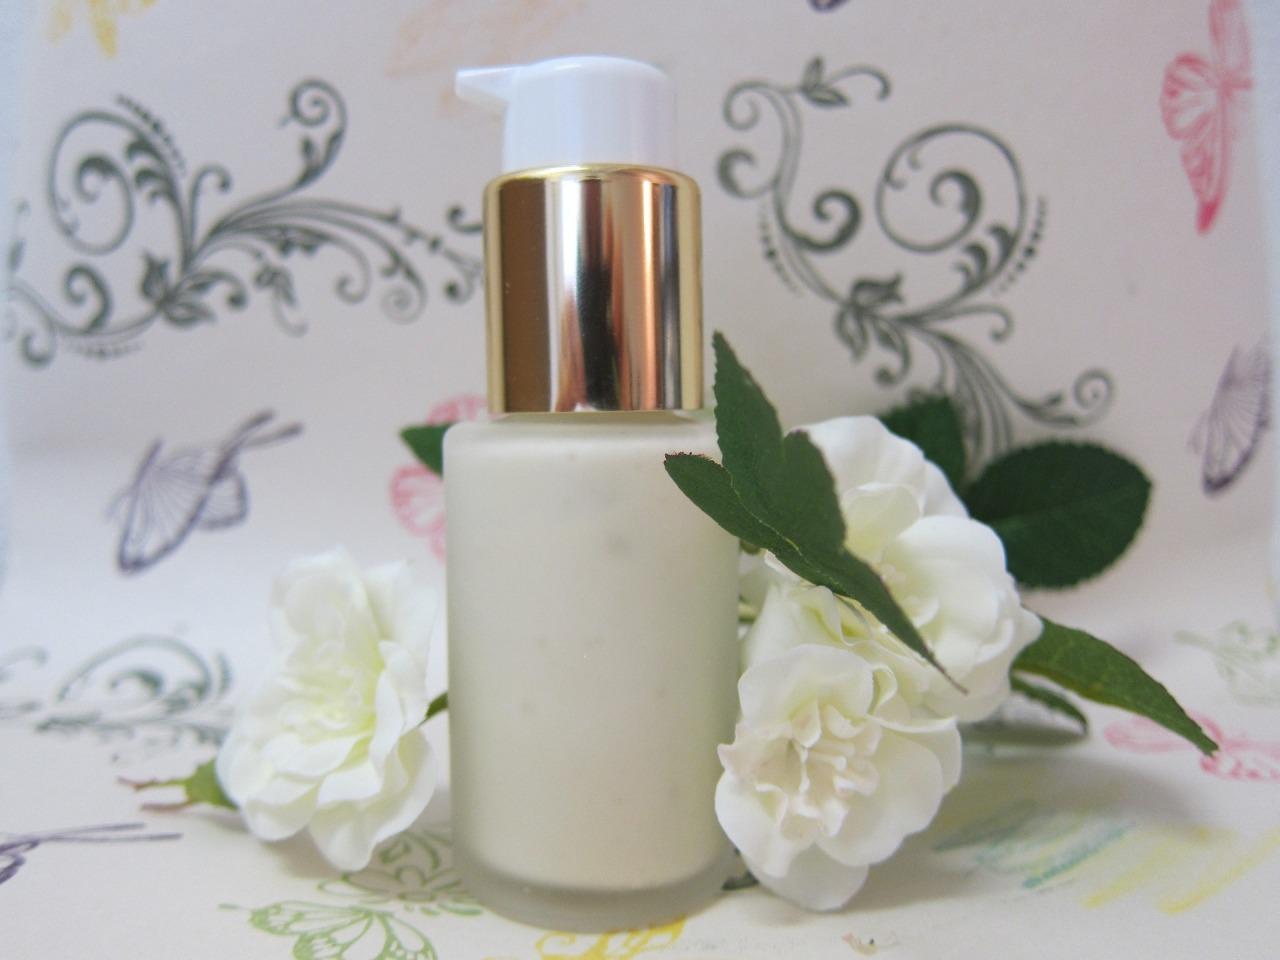 skin-care-1309504_1920